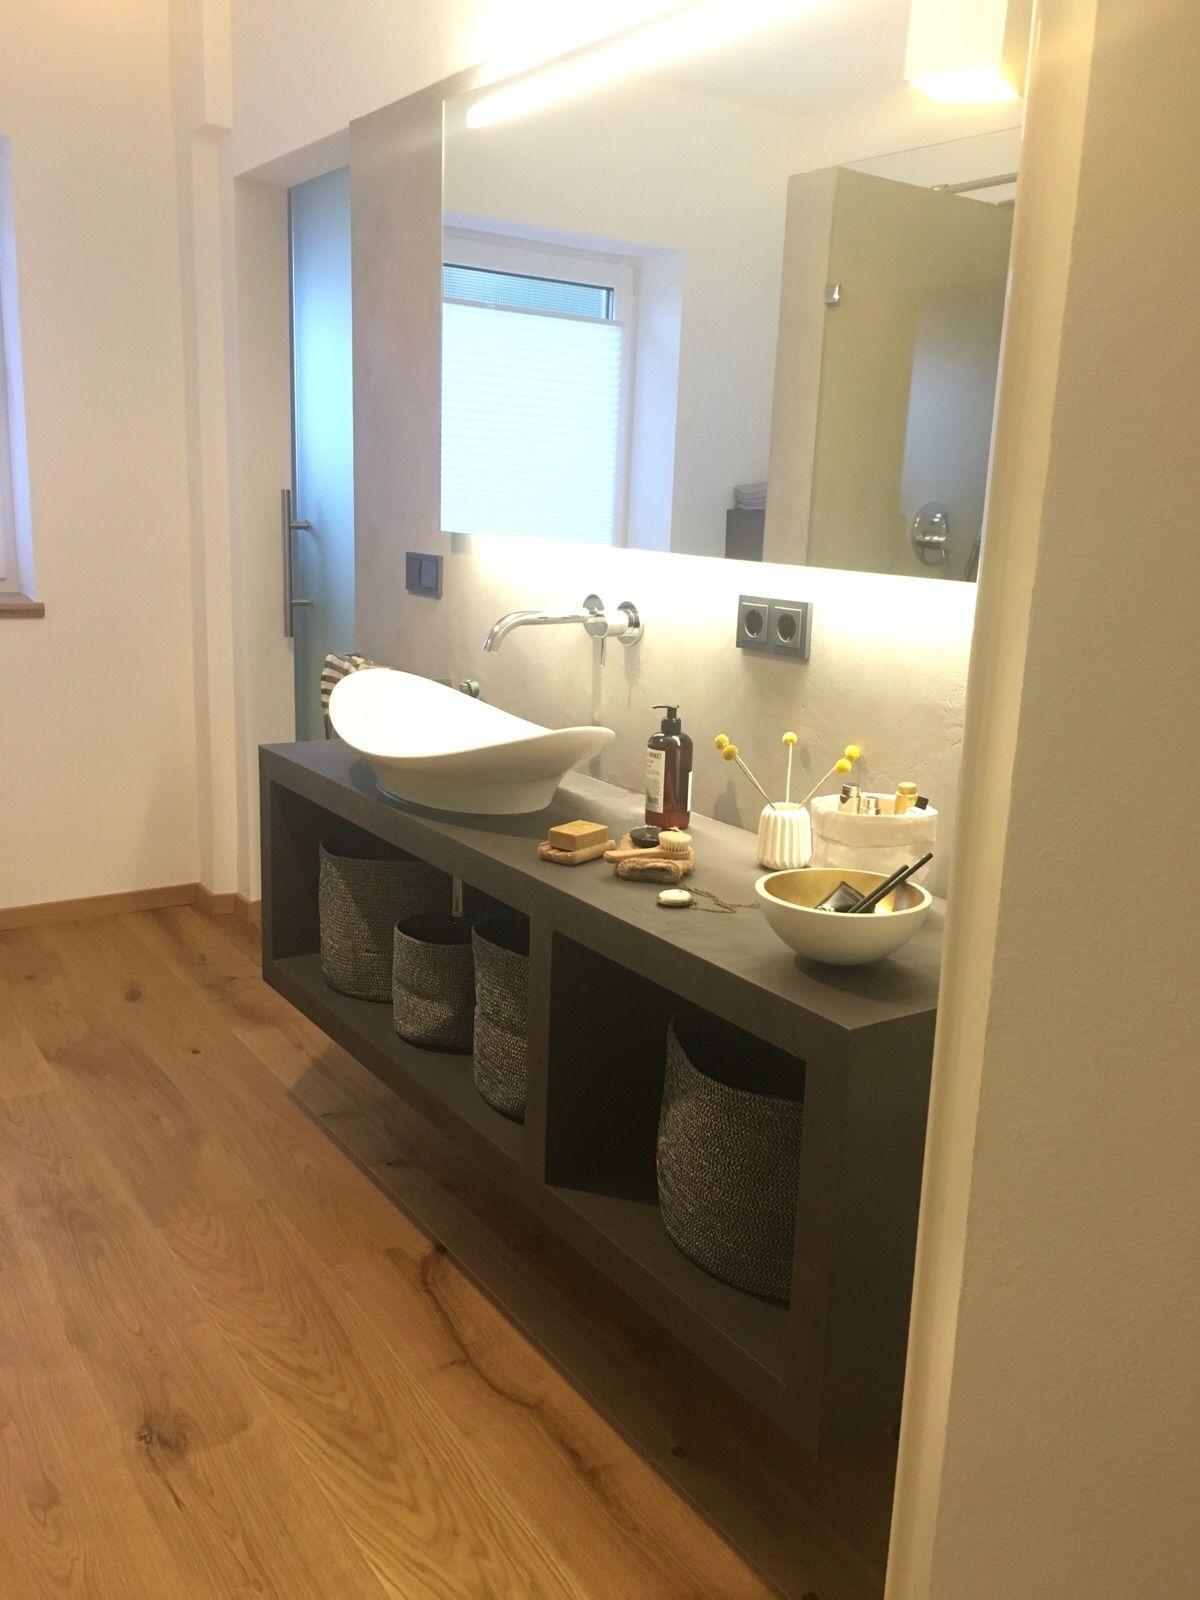 diy waschtisch aus beton ciré | badezimmer | pinterest | waschtisch